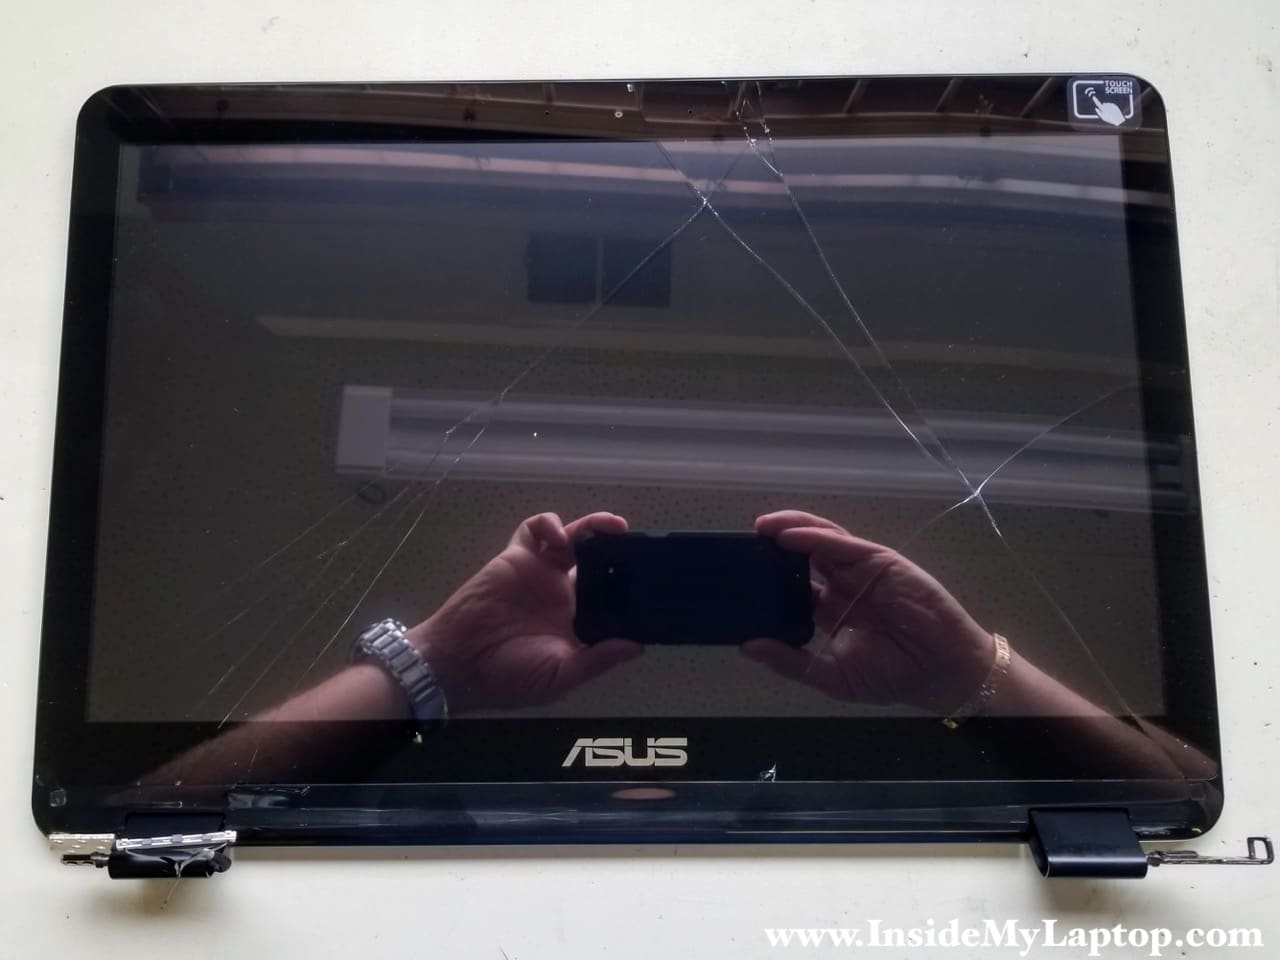 How to disassemble Asus Q553 Q553U Q553UB – Inside my laptop